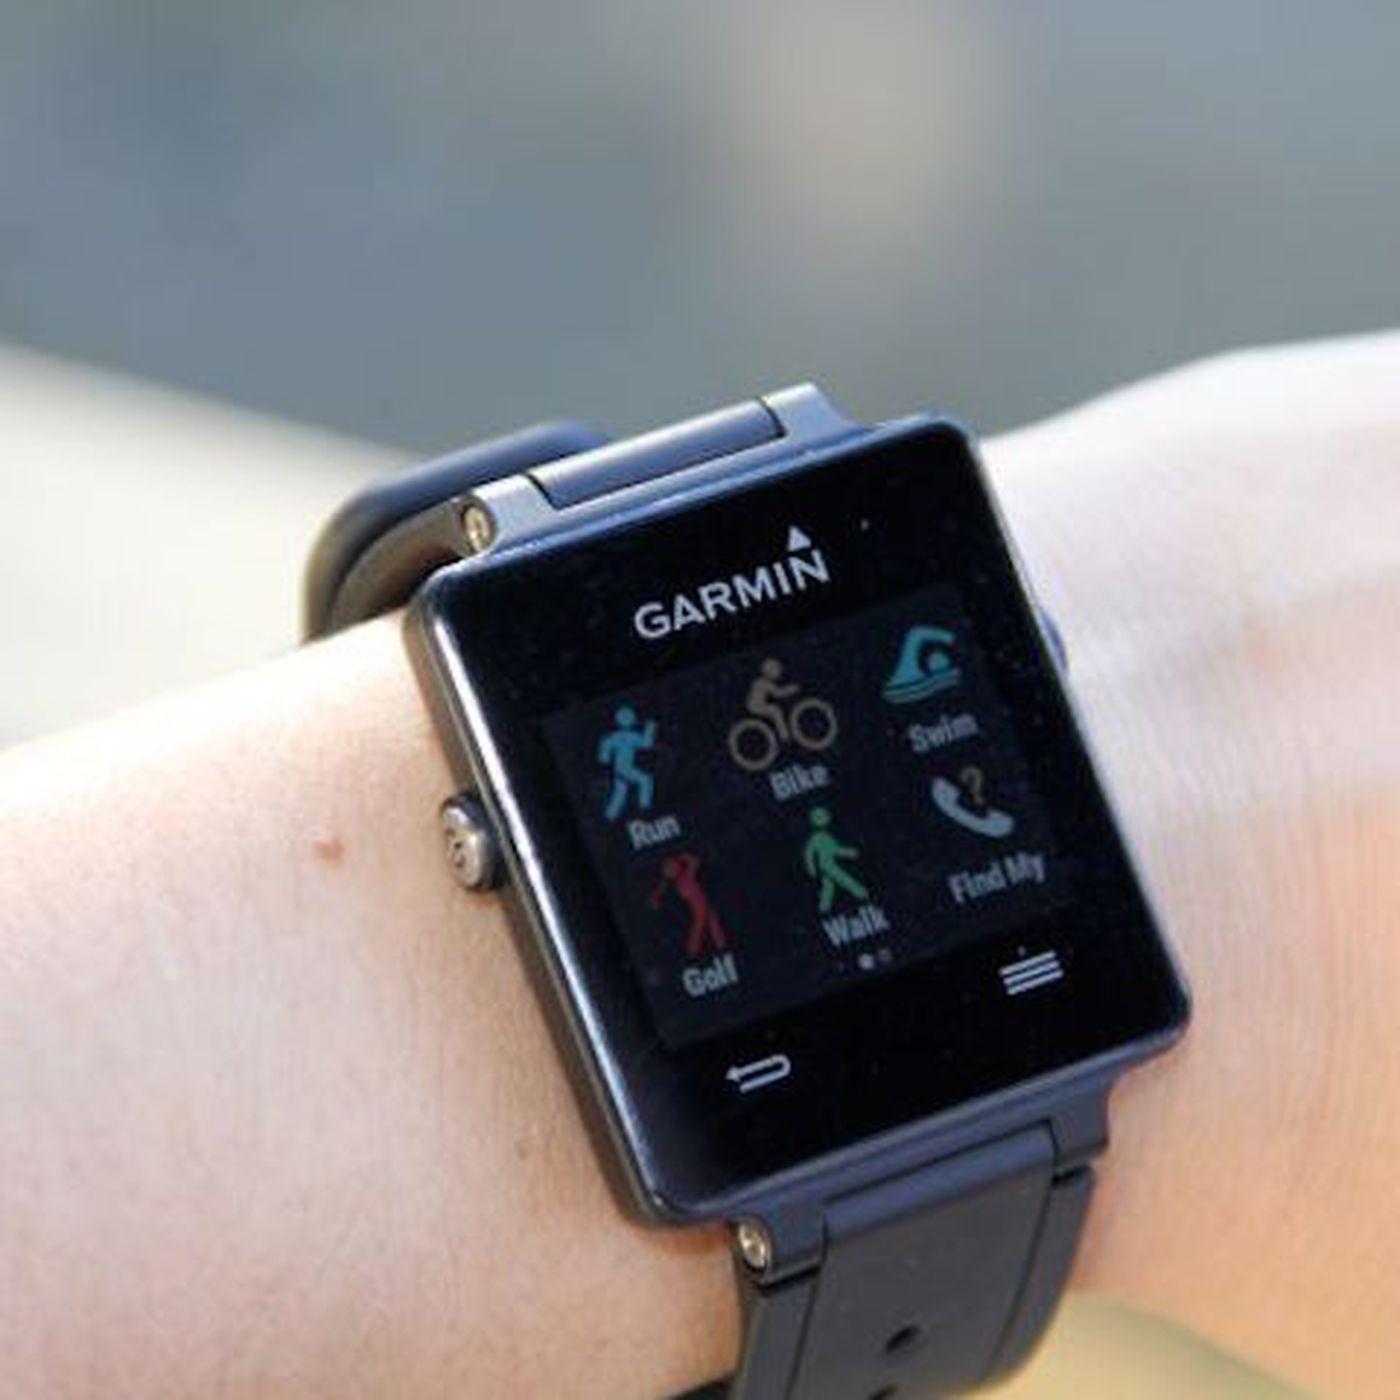 Garmin's Vivoactive Is a Hybrid Sports Watch and Smartwatch